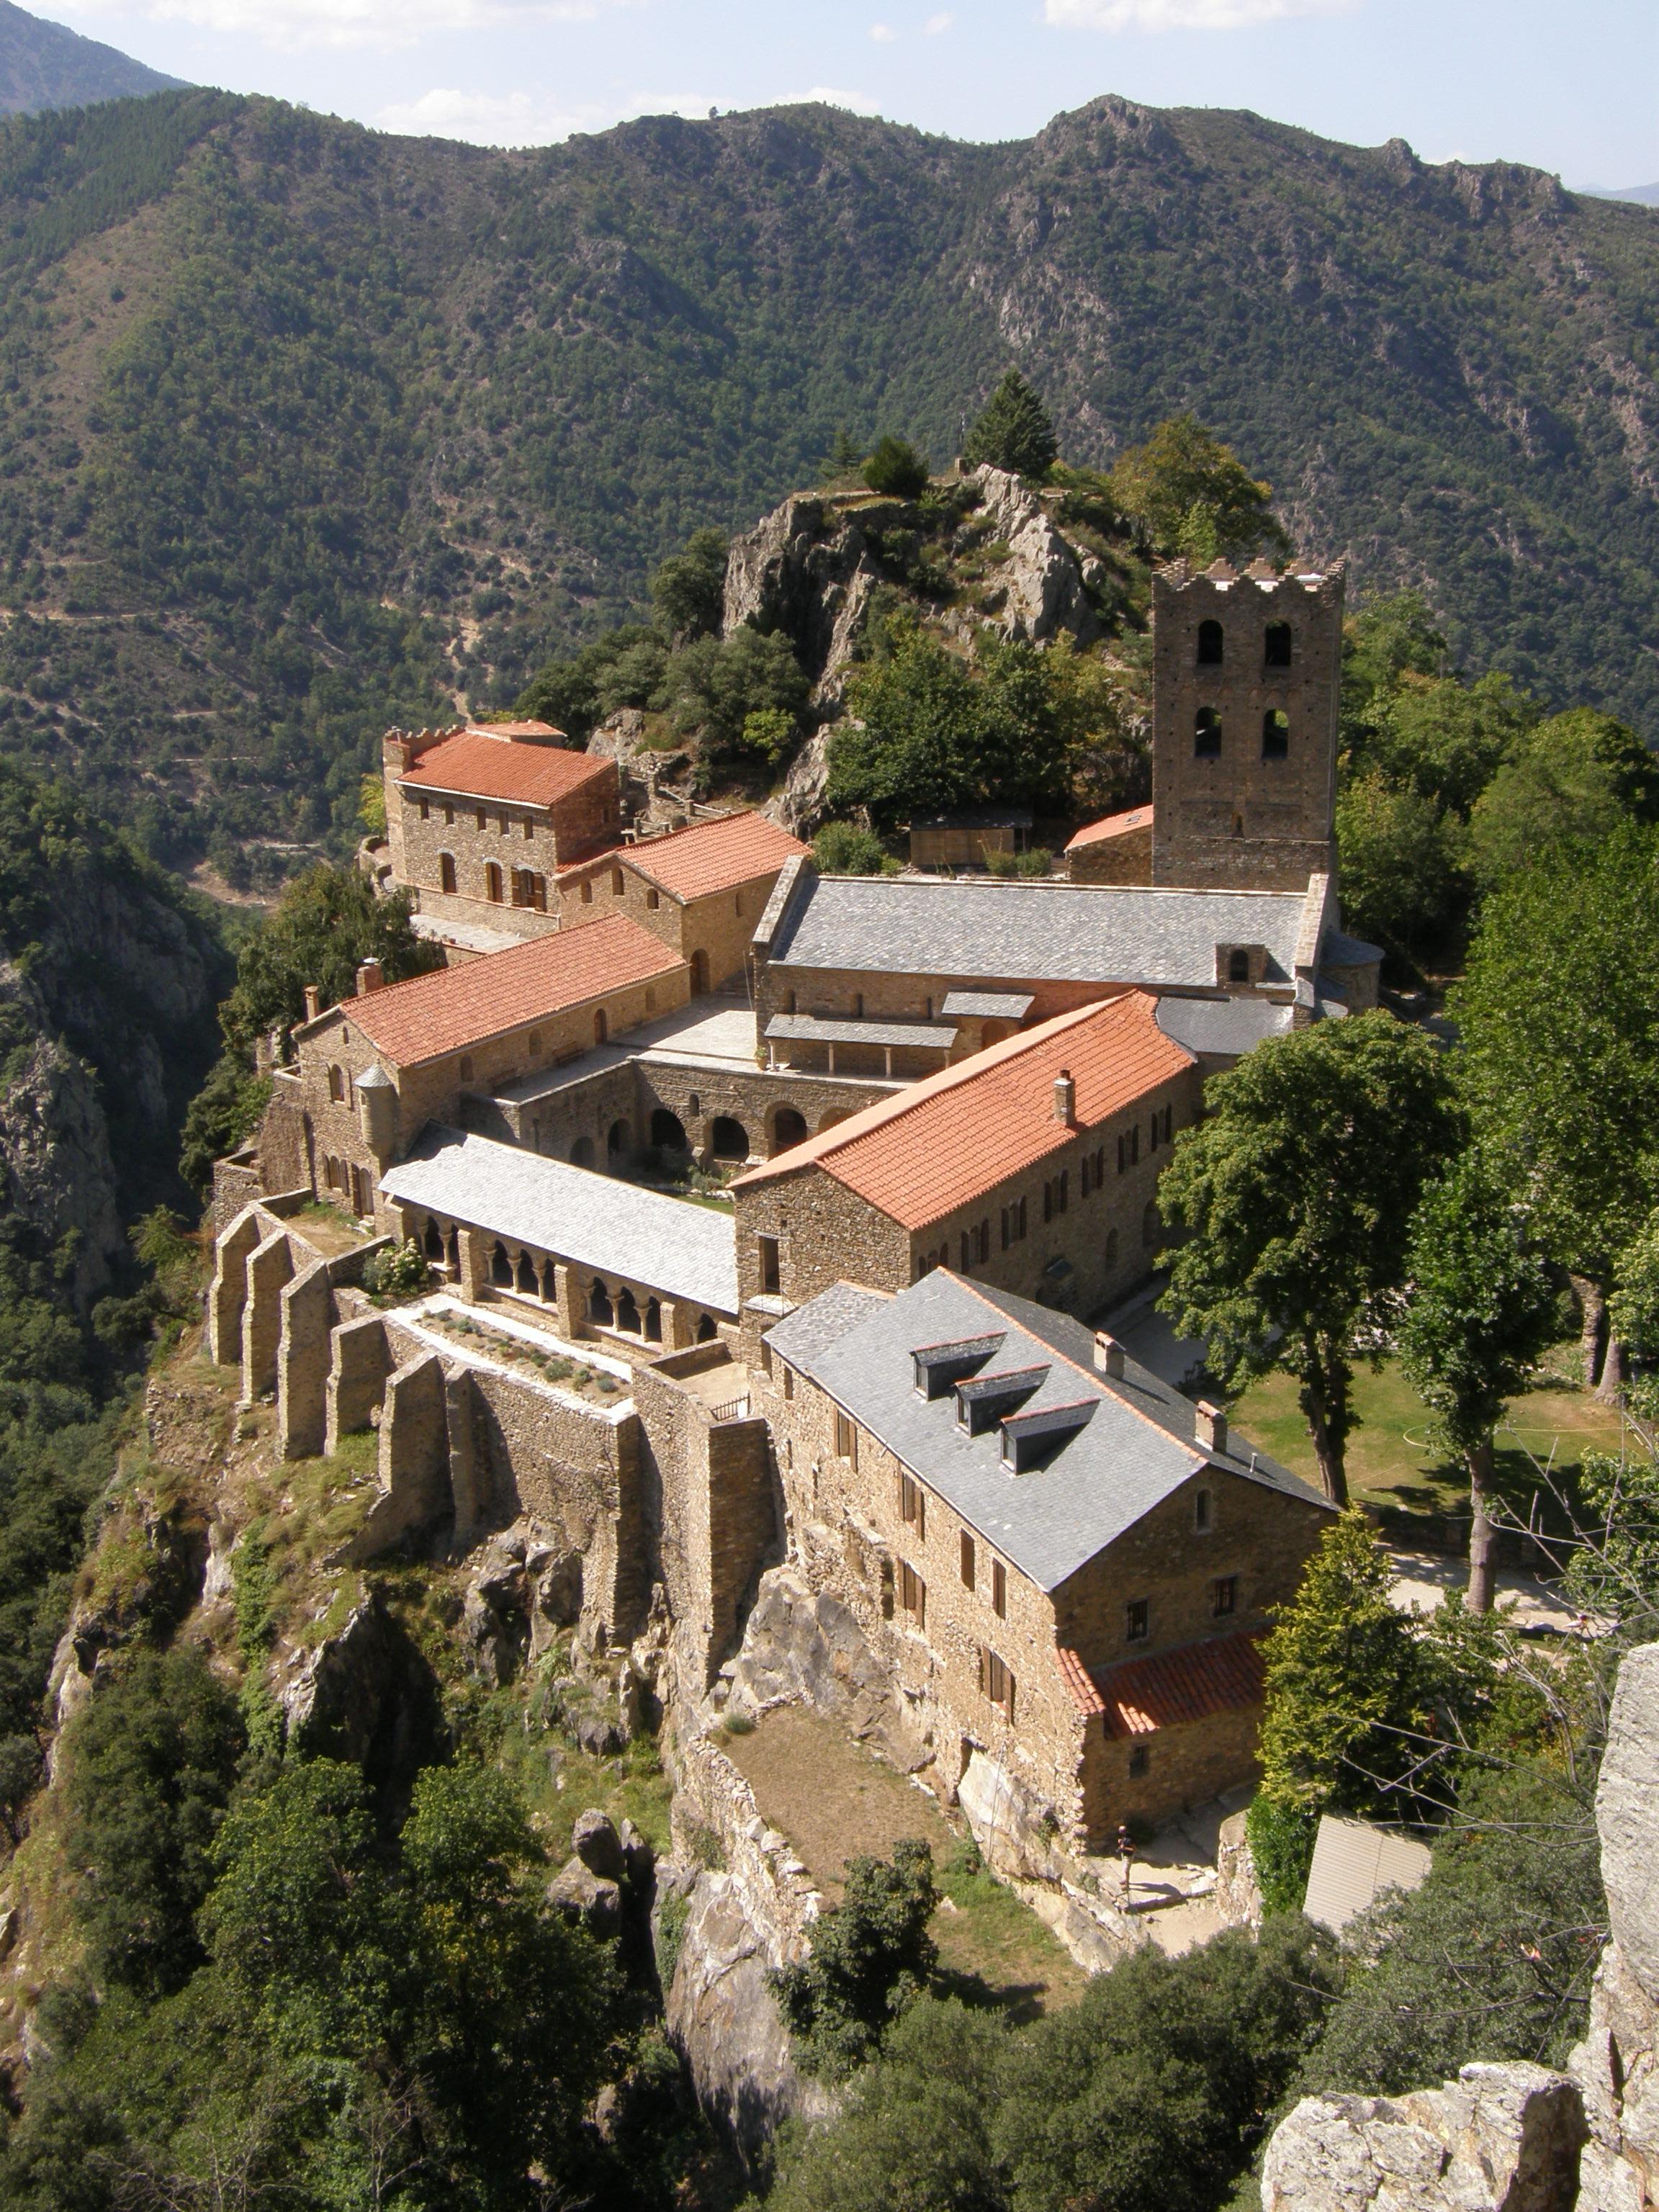 L'abbaye Saint-Martin du Canigou (en catalan : Sant Martí del Canigó)